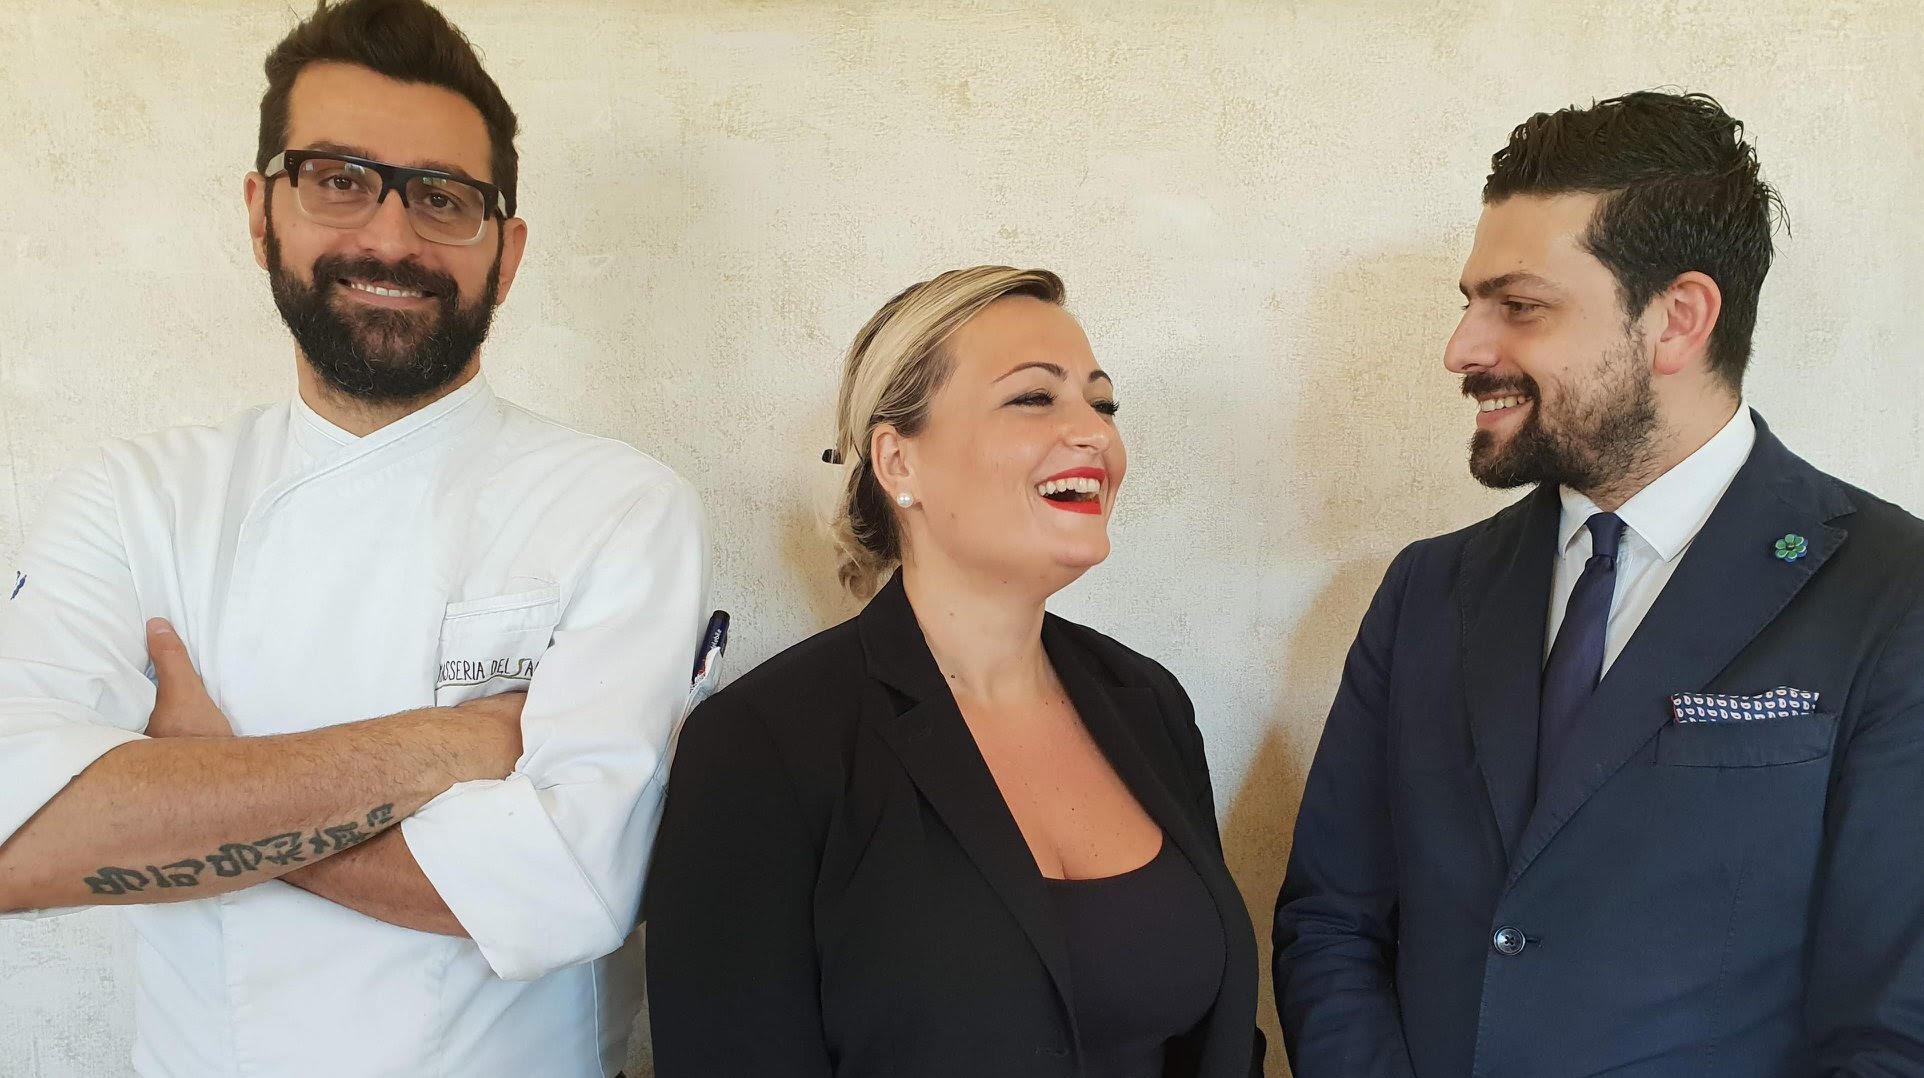 Da sinistra: Chef Marco Marinelli; Maitre e Sommelier Simona Fusco; Propietario, Maitre e Sommelier Andrea Lippi